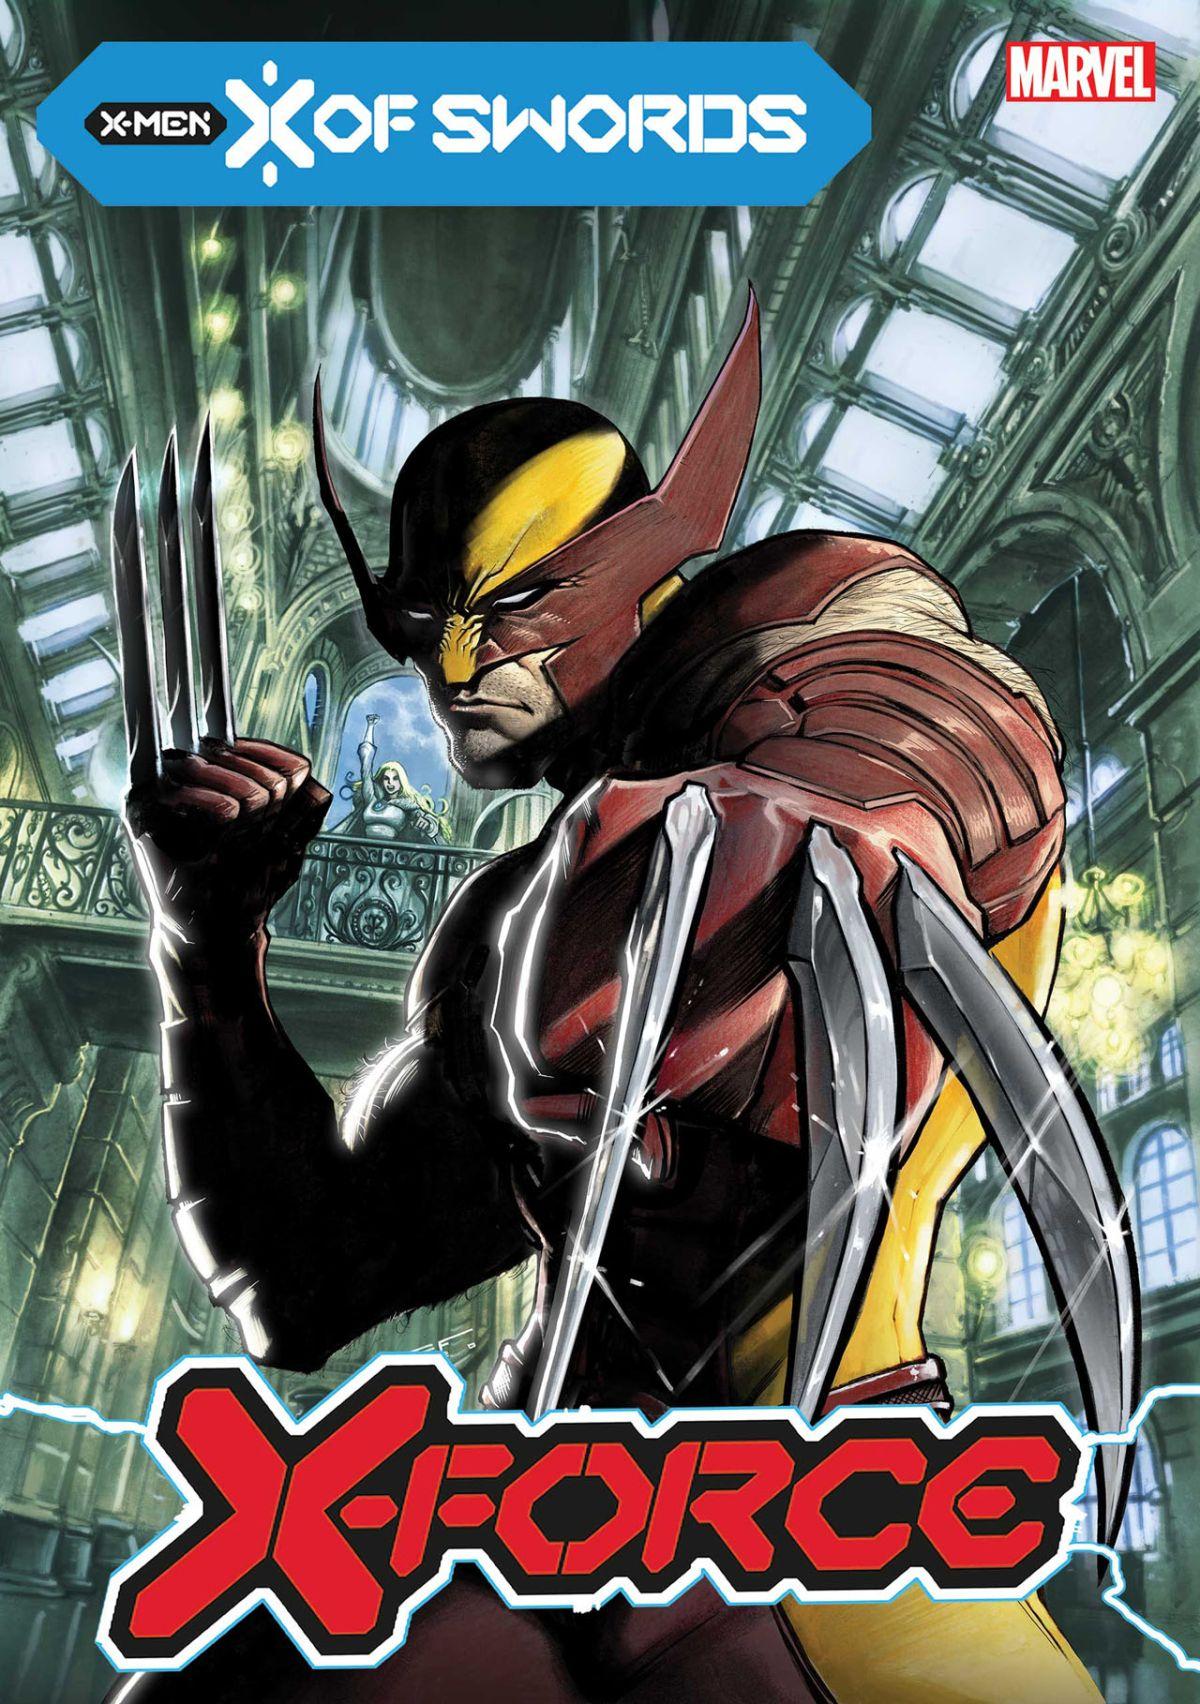 CHAMPIONS #26 LIEFELD UNCANNY X-MEN VARIANT MARVEL COMICS WOLVERINE